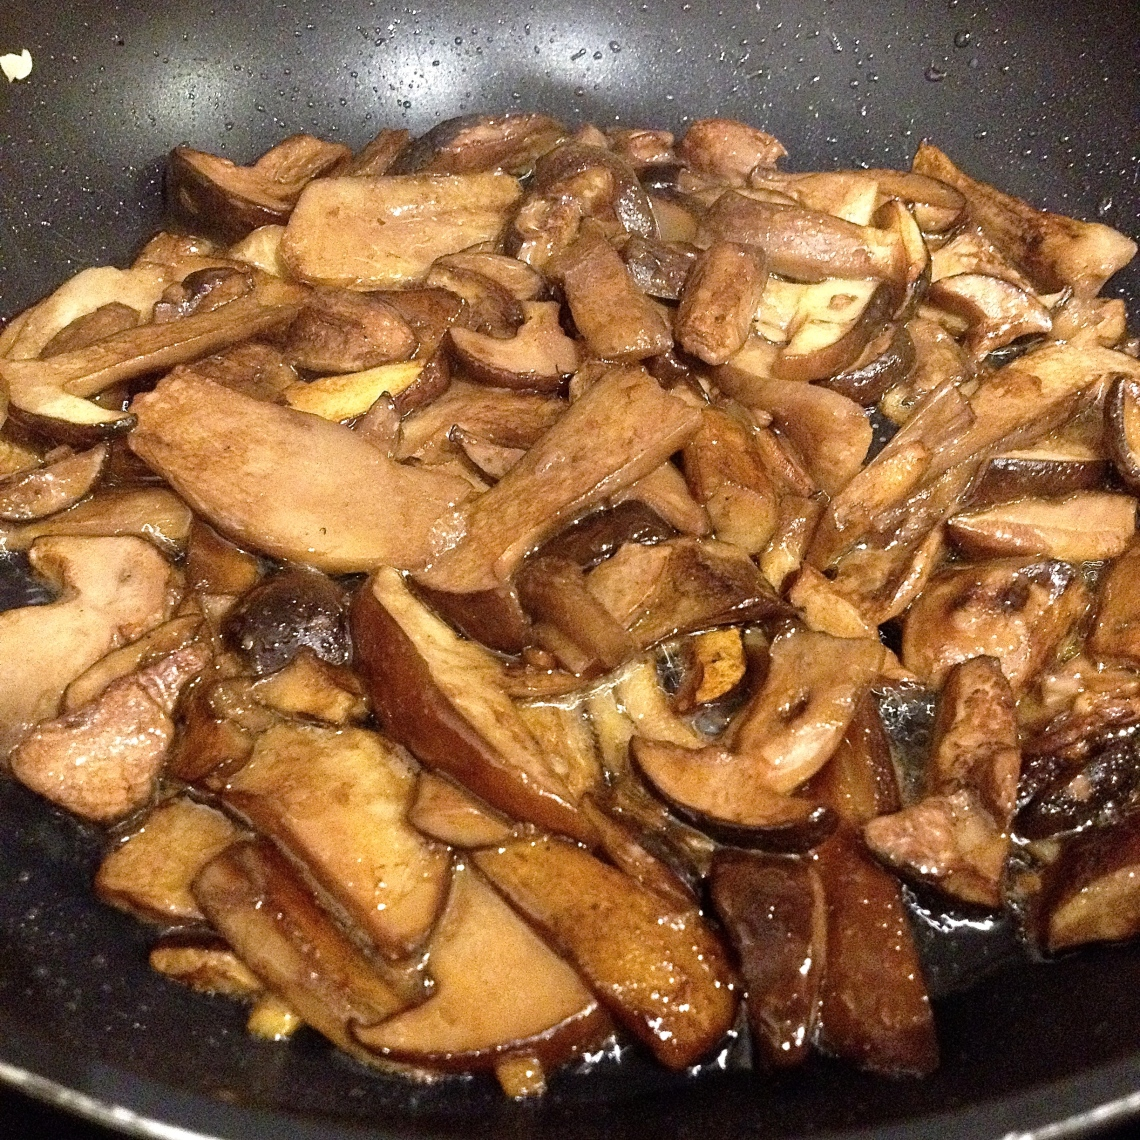 Cueillette sauvage champignon 53